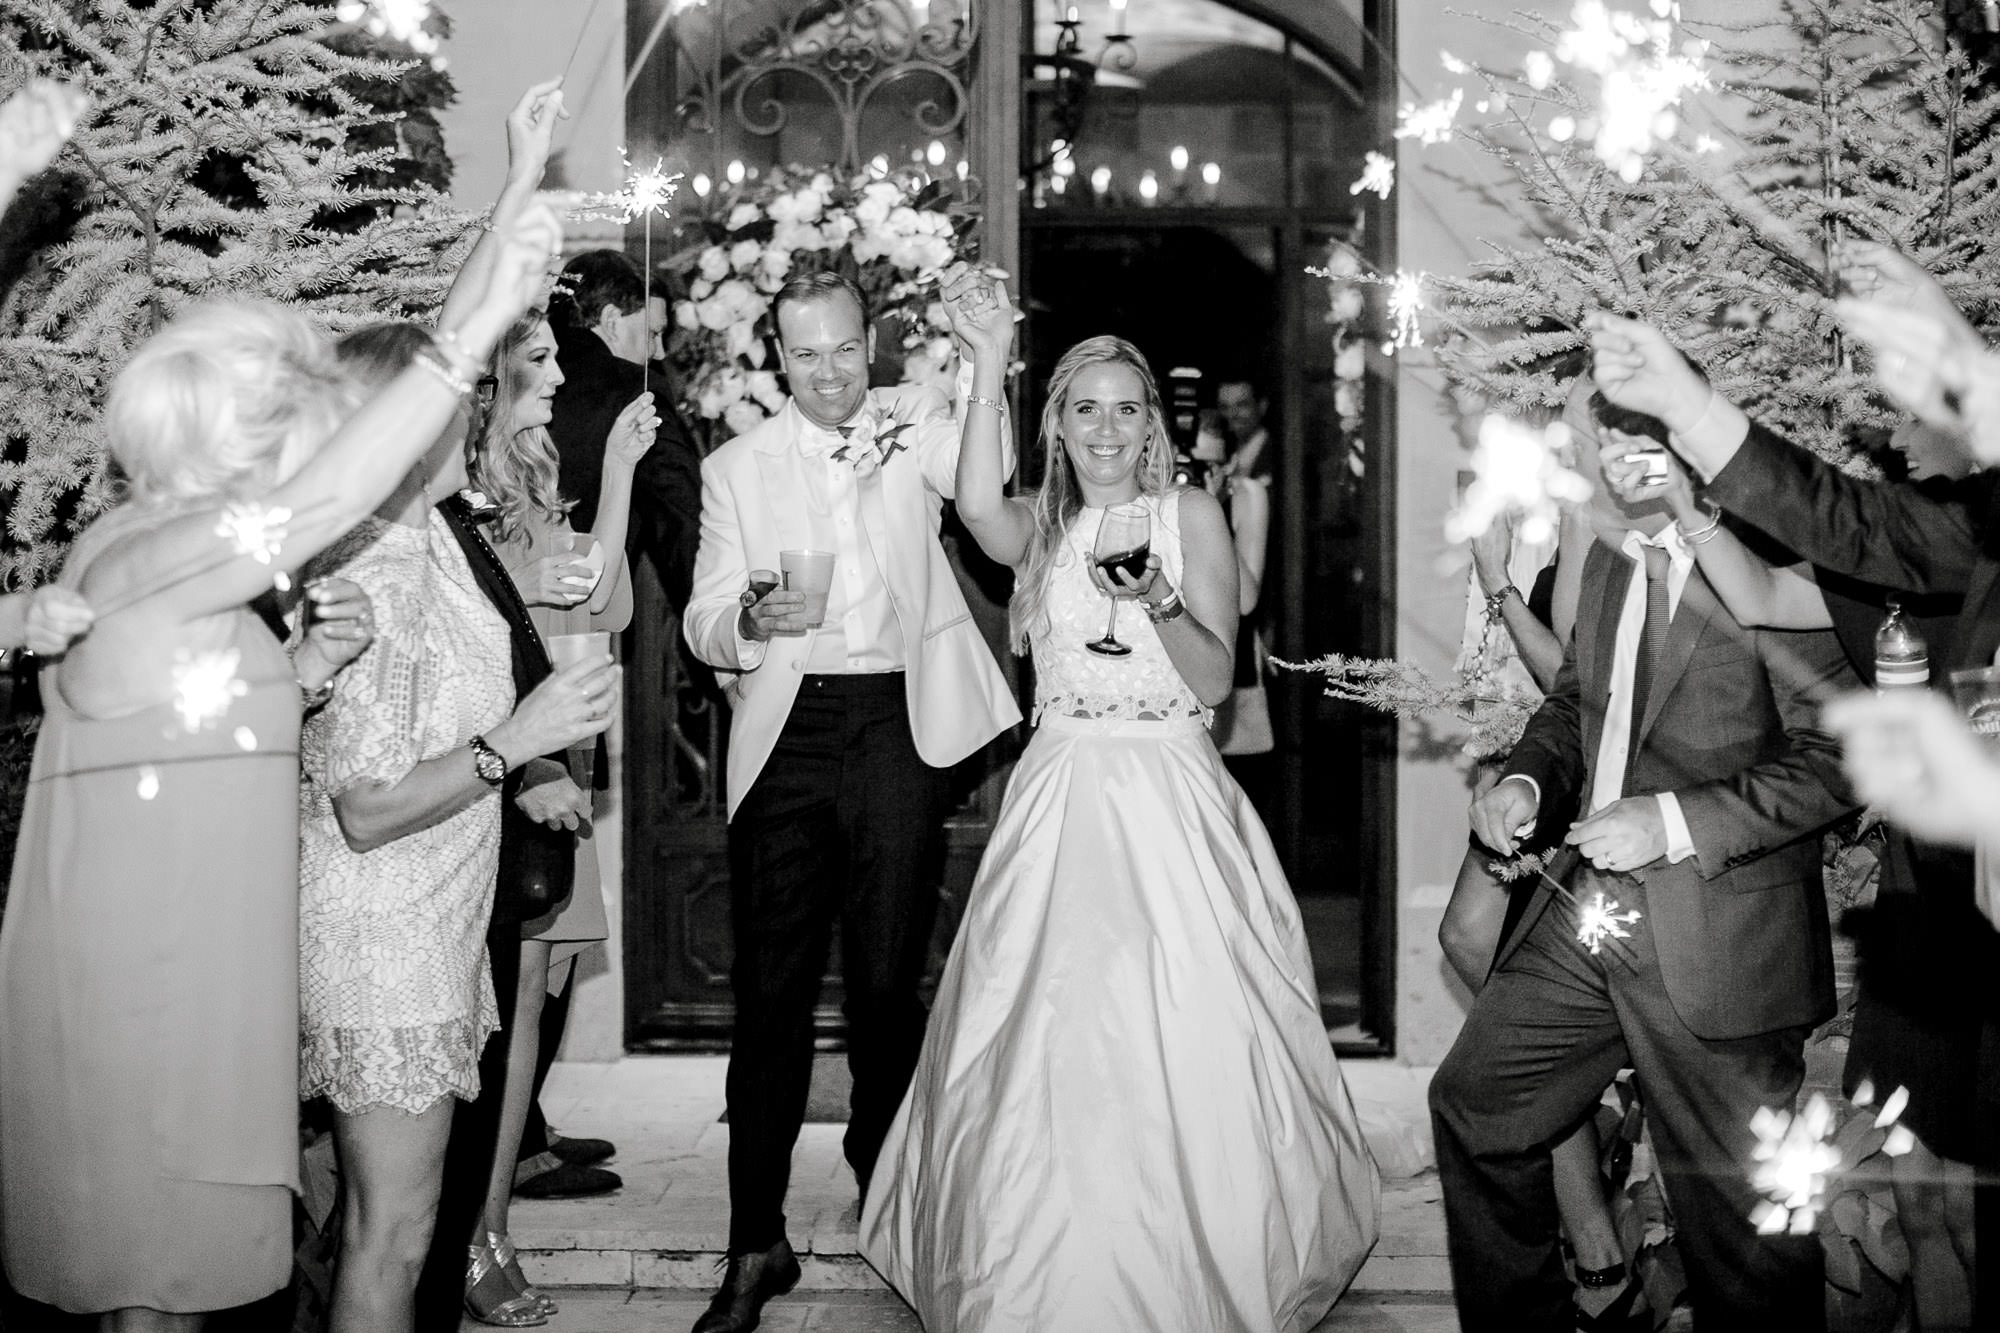 ali-brandon-hamilton-lubbock-wedding-photographer-estate-lee-lewis-construction-bee-alleej_0114.jpg